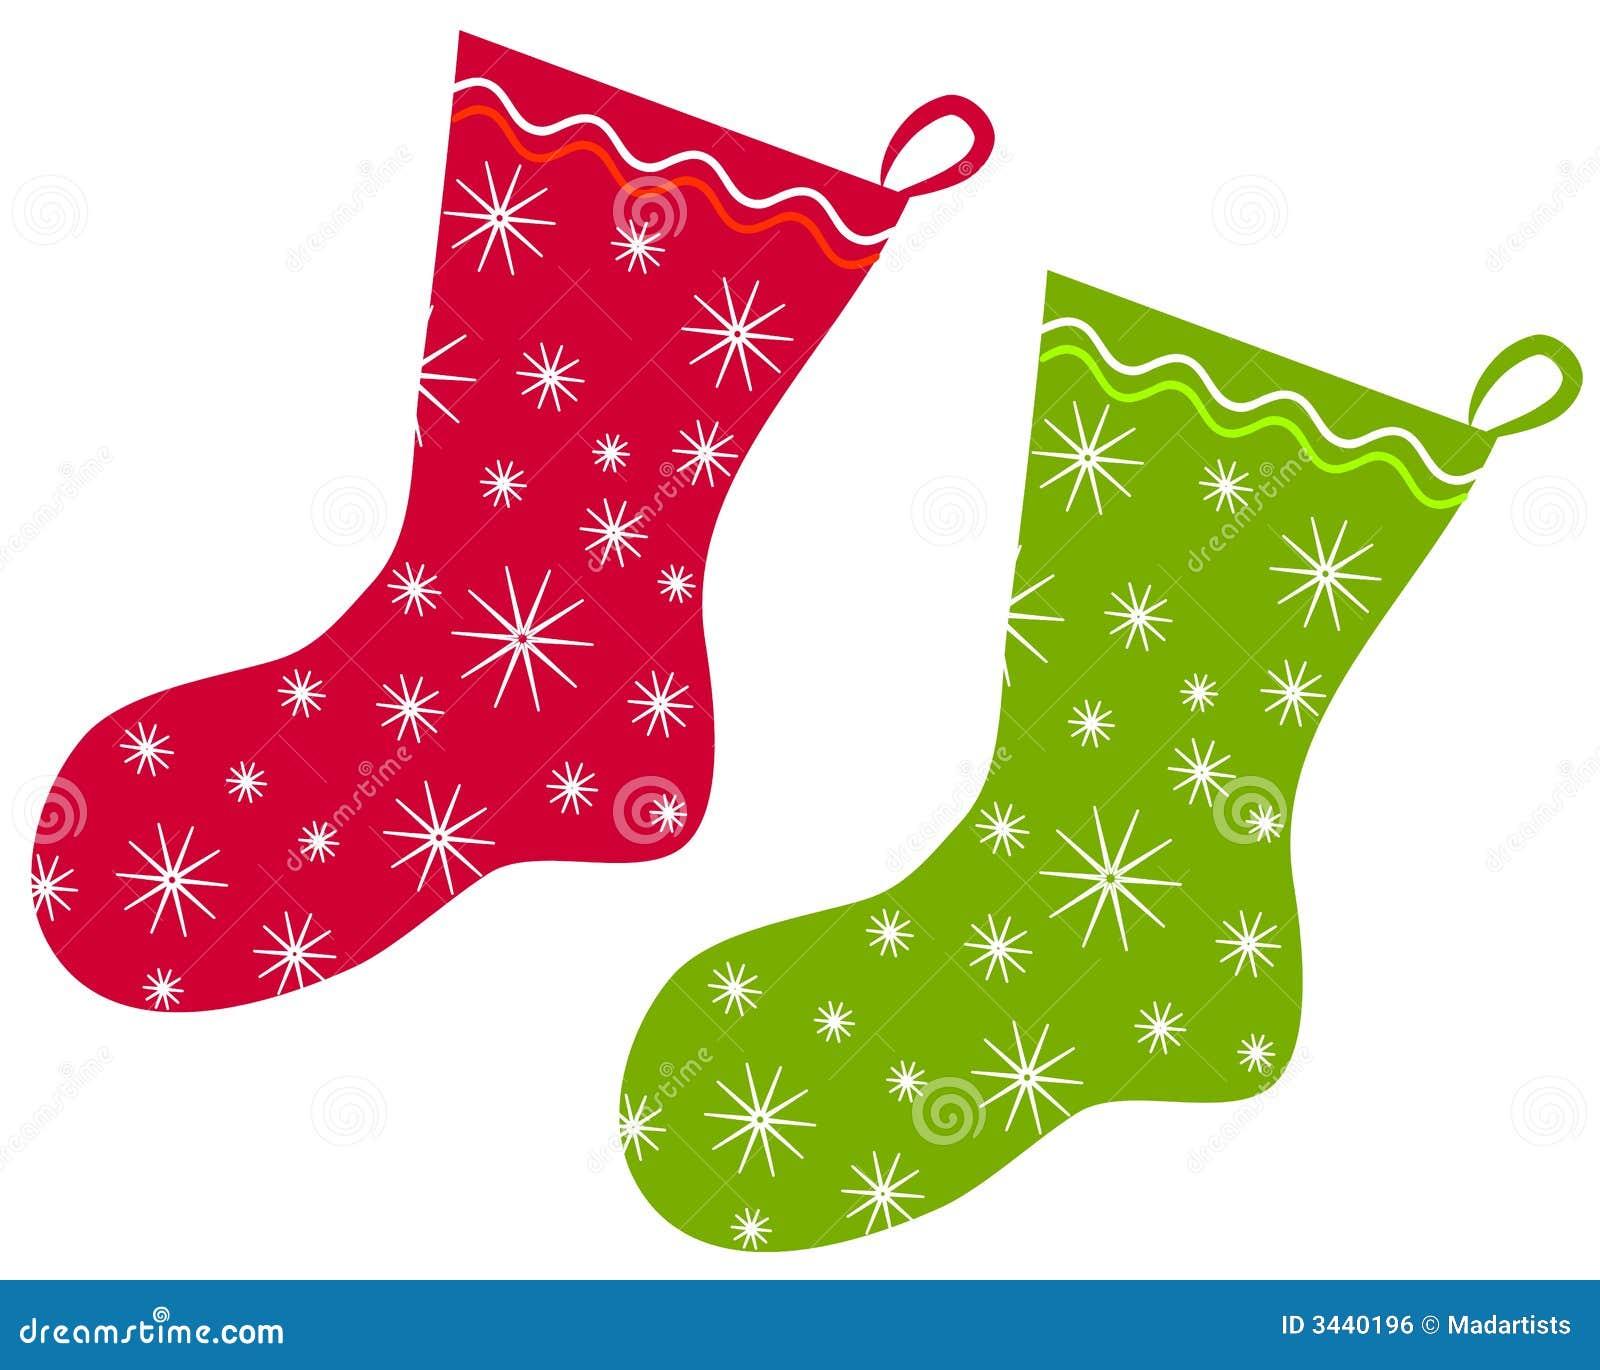 Hanging Christmas Stockings Clipart christmas stockings clip art 2 ...